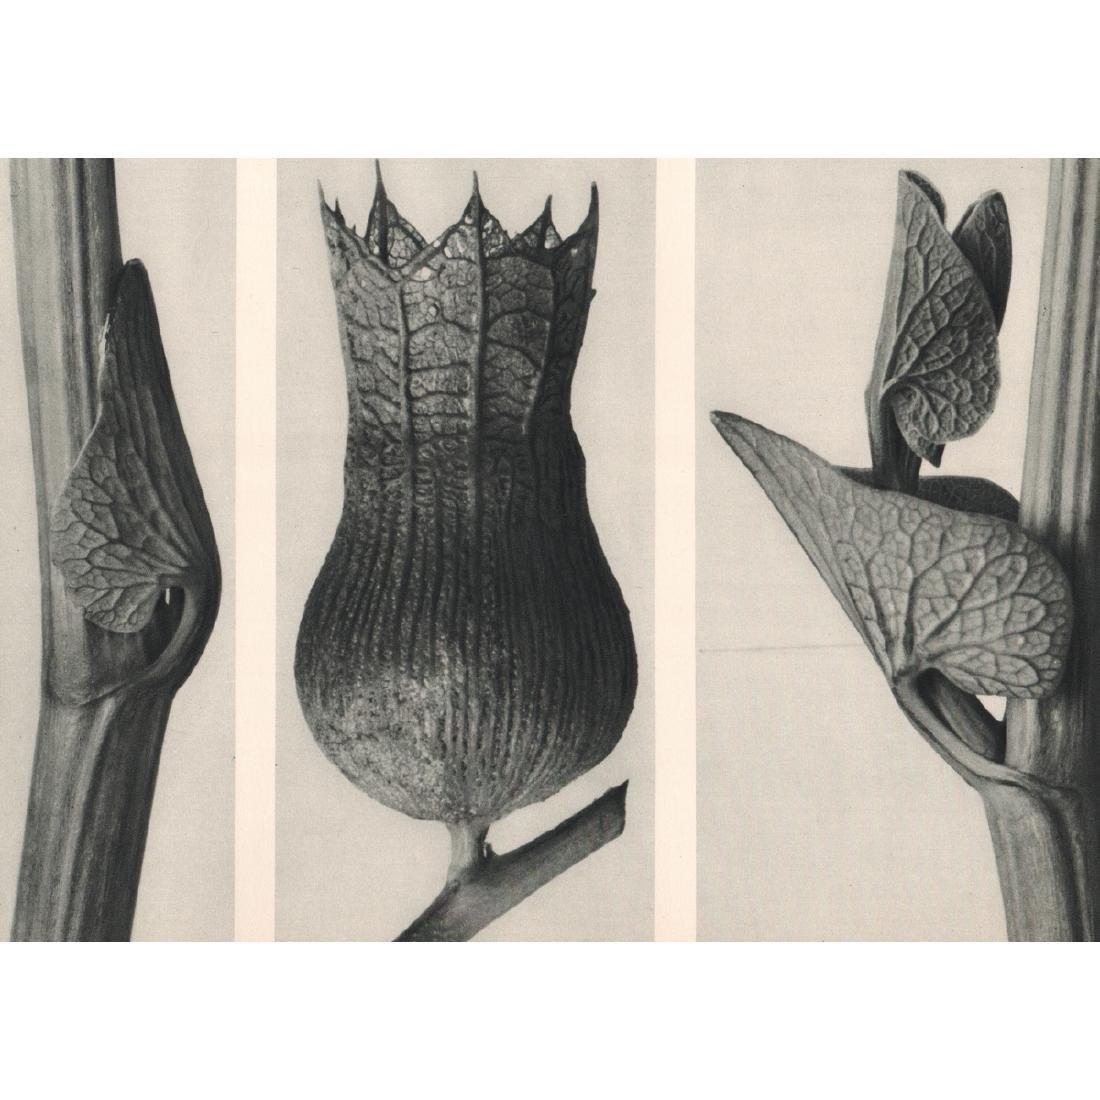 KARL BLOSSFELDT - Aristolochia clematitis & Hyoscyamus